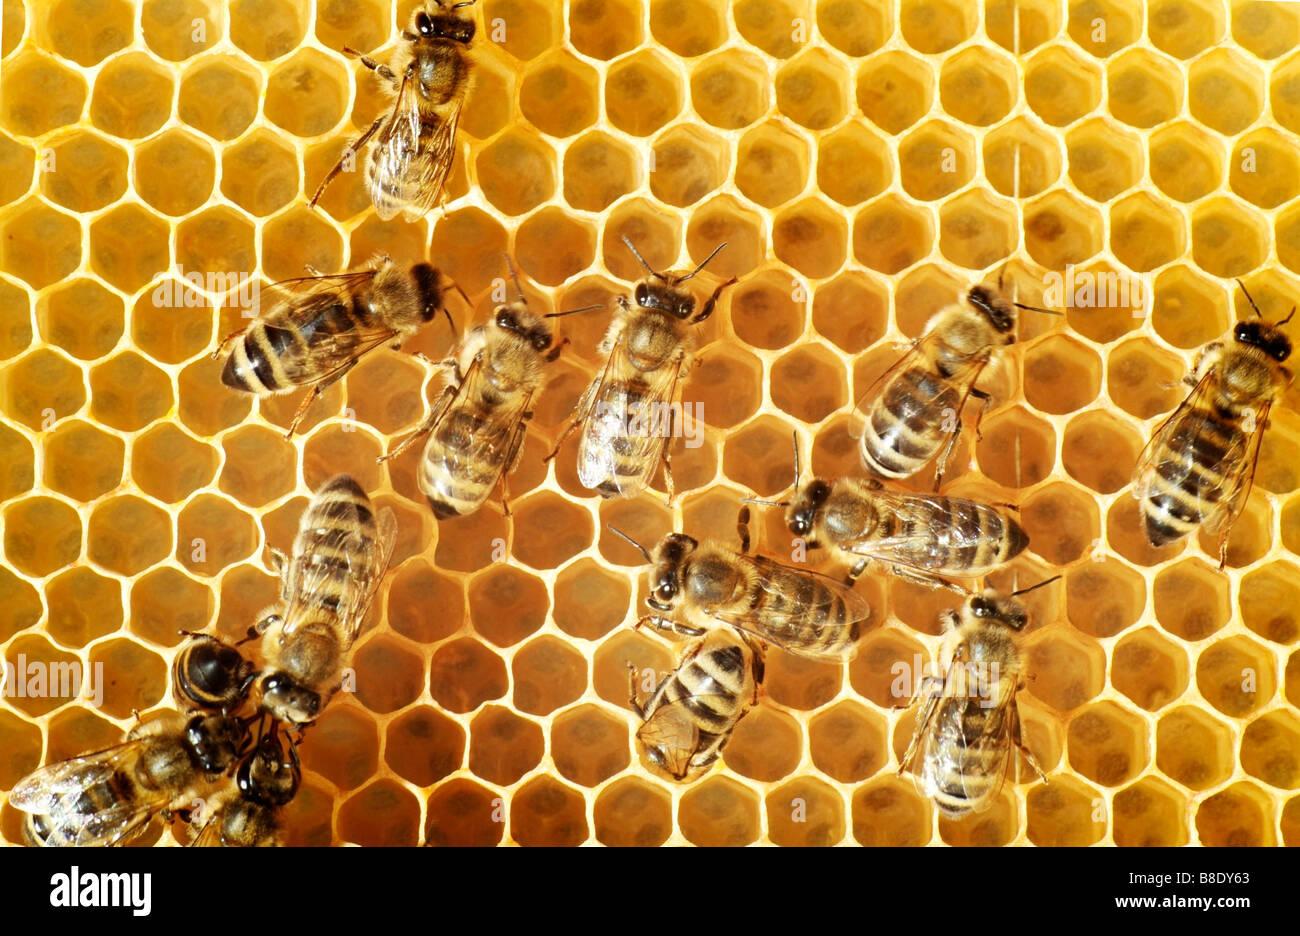 Vista aérea de las abejas en un panal Imagen De Stock